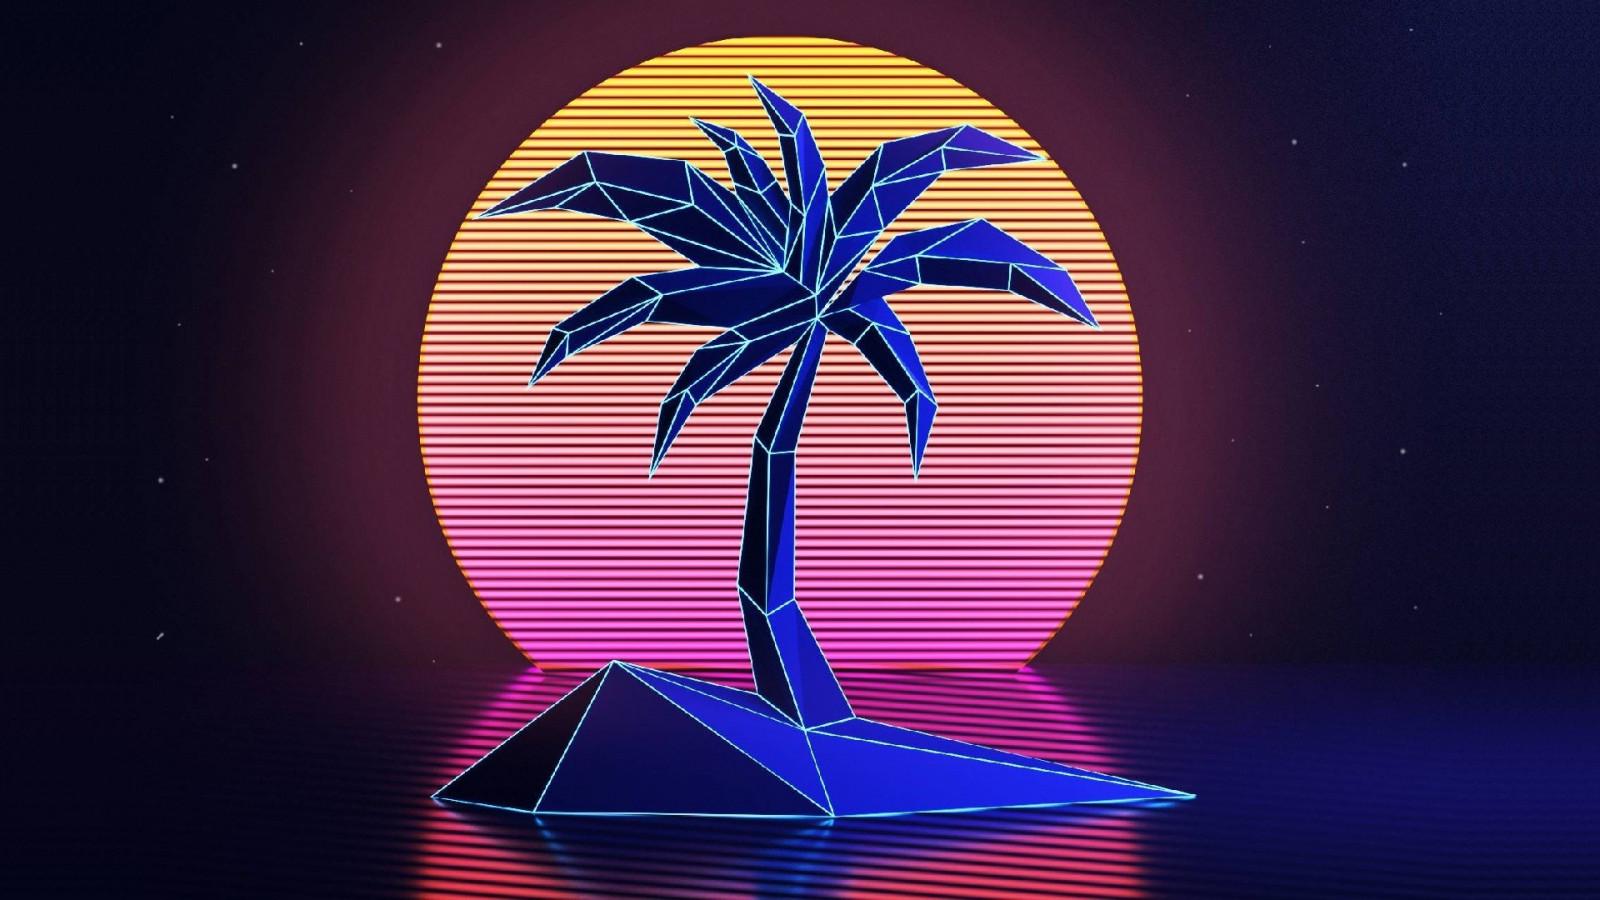 Wallpaper : sunset, neon, graphic design, palm trees ...